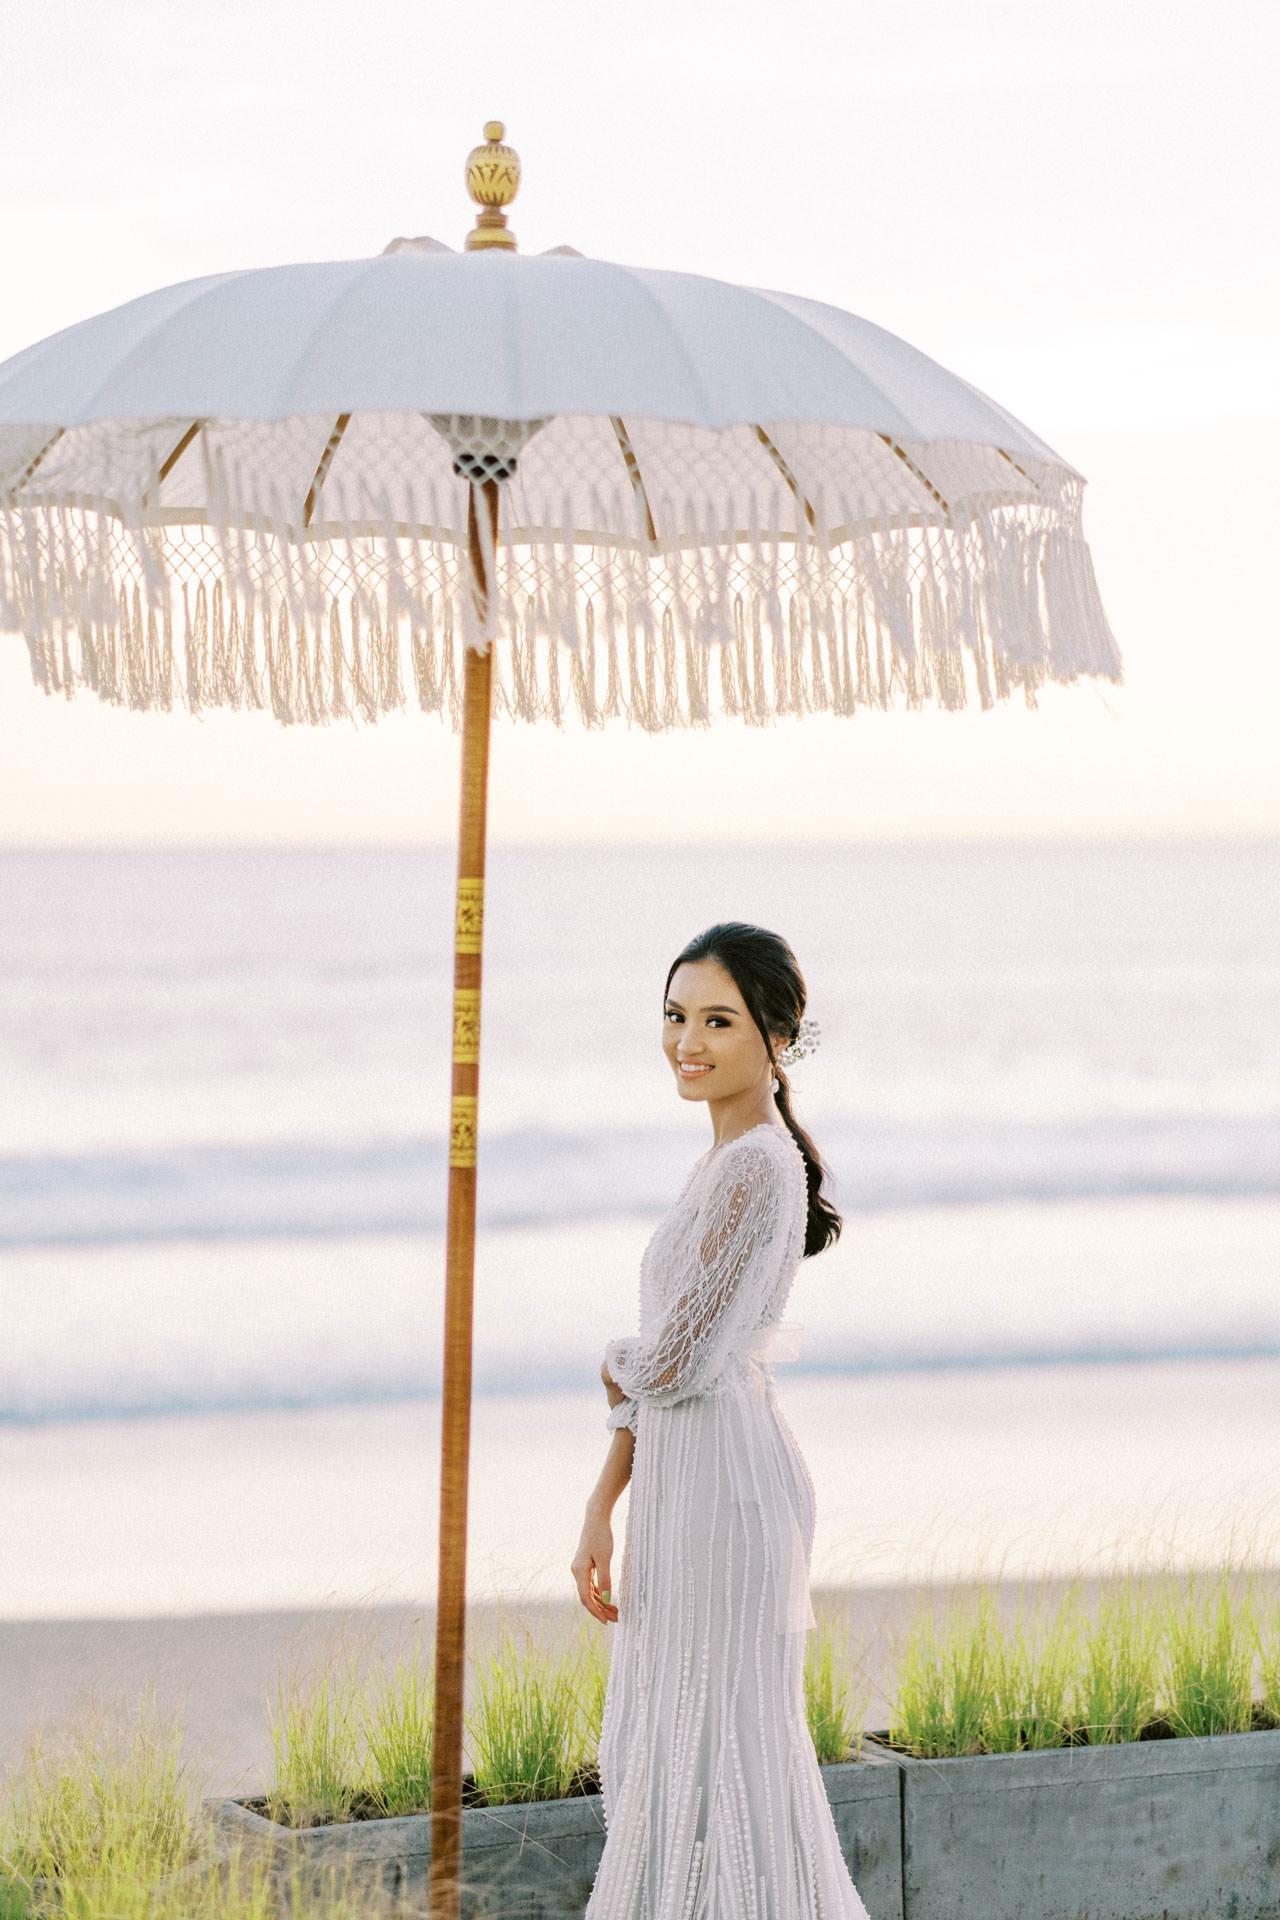 Bali Beach Glamping Wedding on a Luxury Tent 51